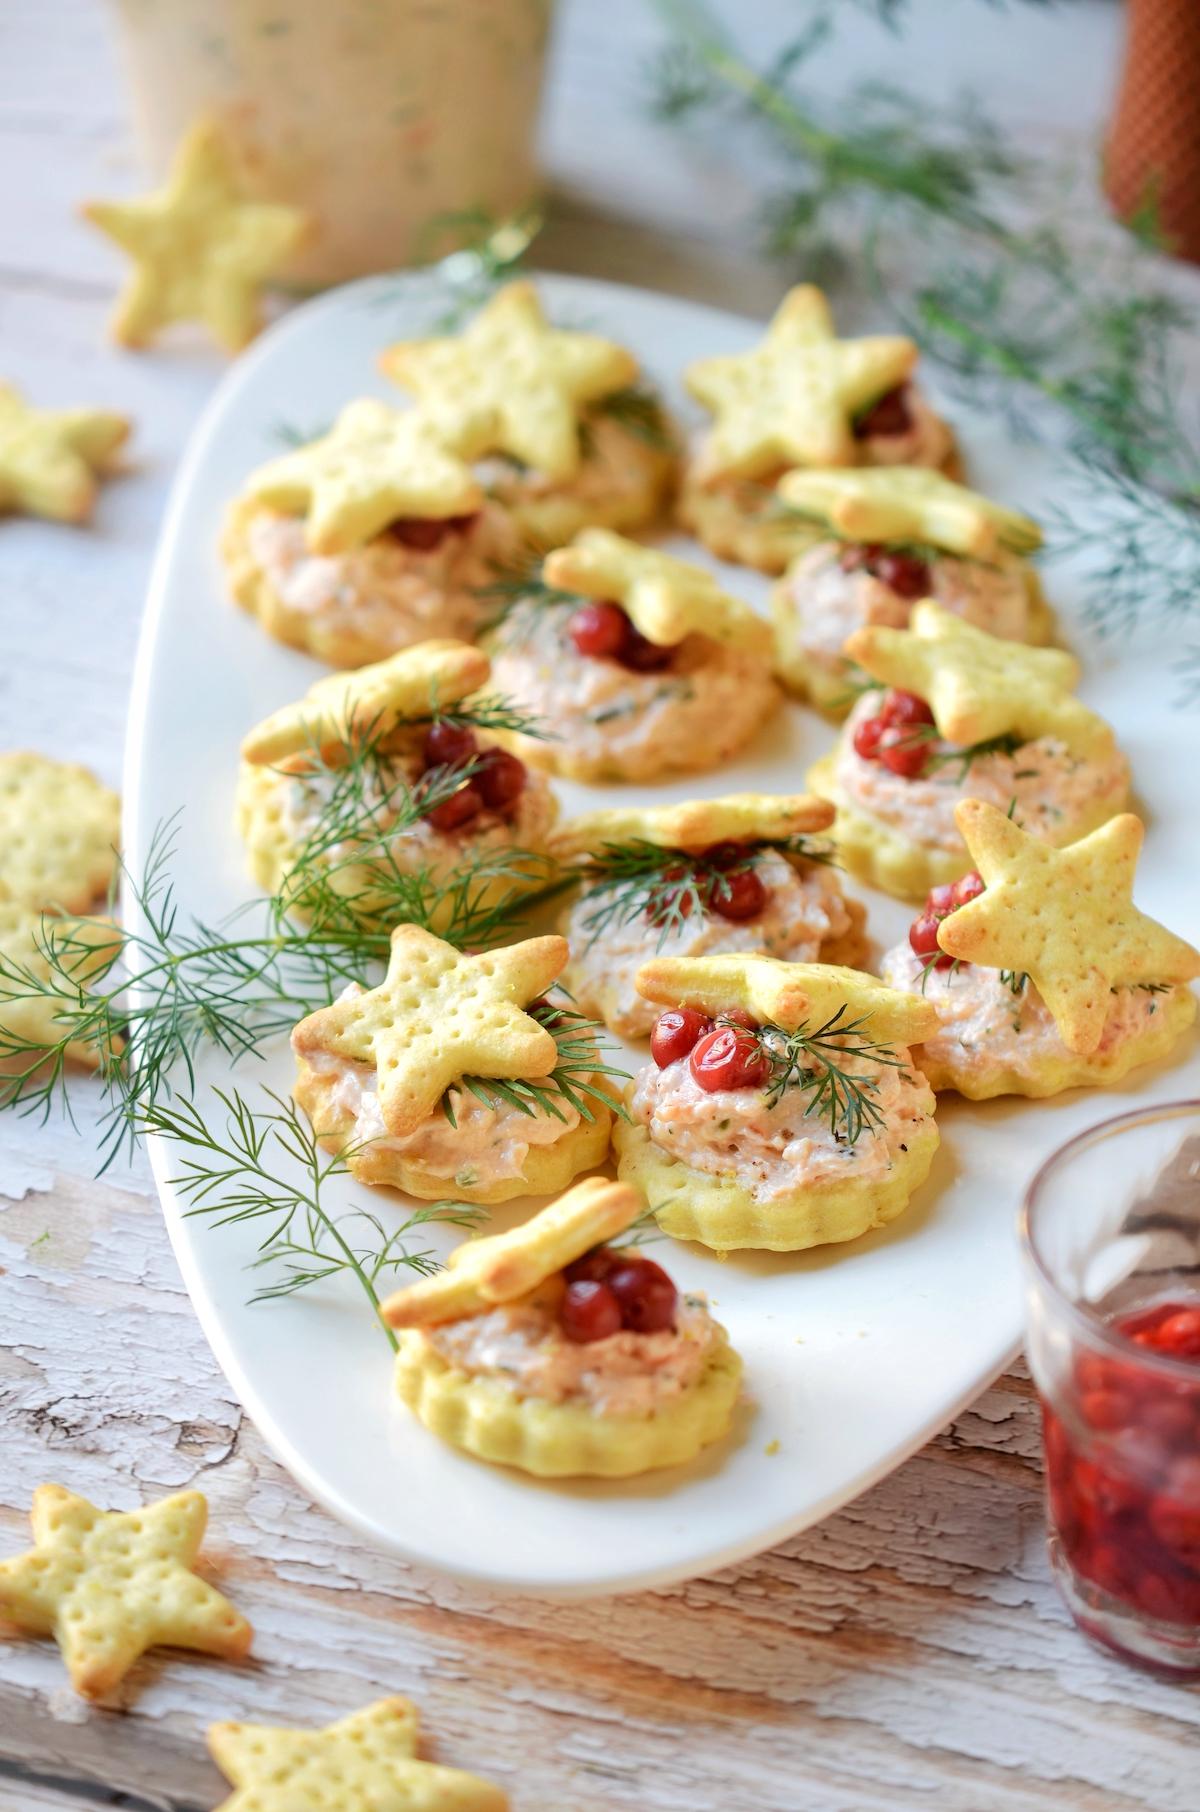 recette apéritif cracker truite festif repas buffet froid réveillon